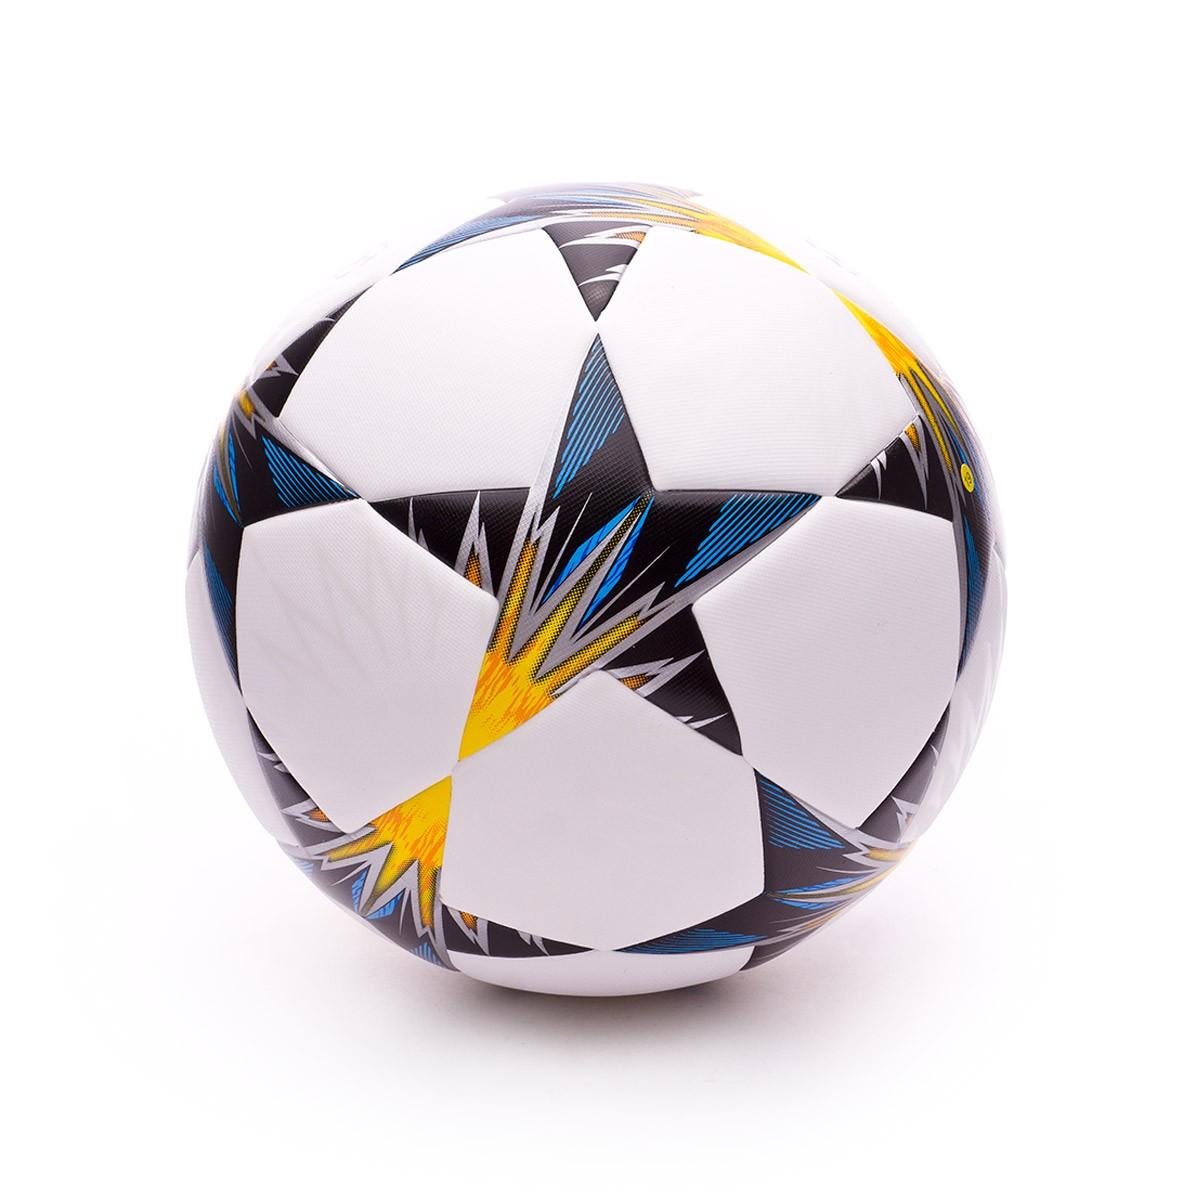 62e02bcfb1569 Ball adidas Finale Kiev TT White-Black-Solar yellow-Blue-Clear aqua-Oran -  Football store Fútbol Emotion